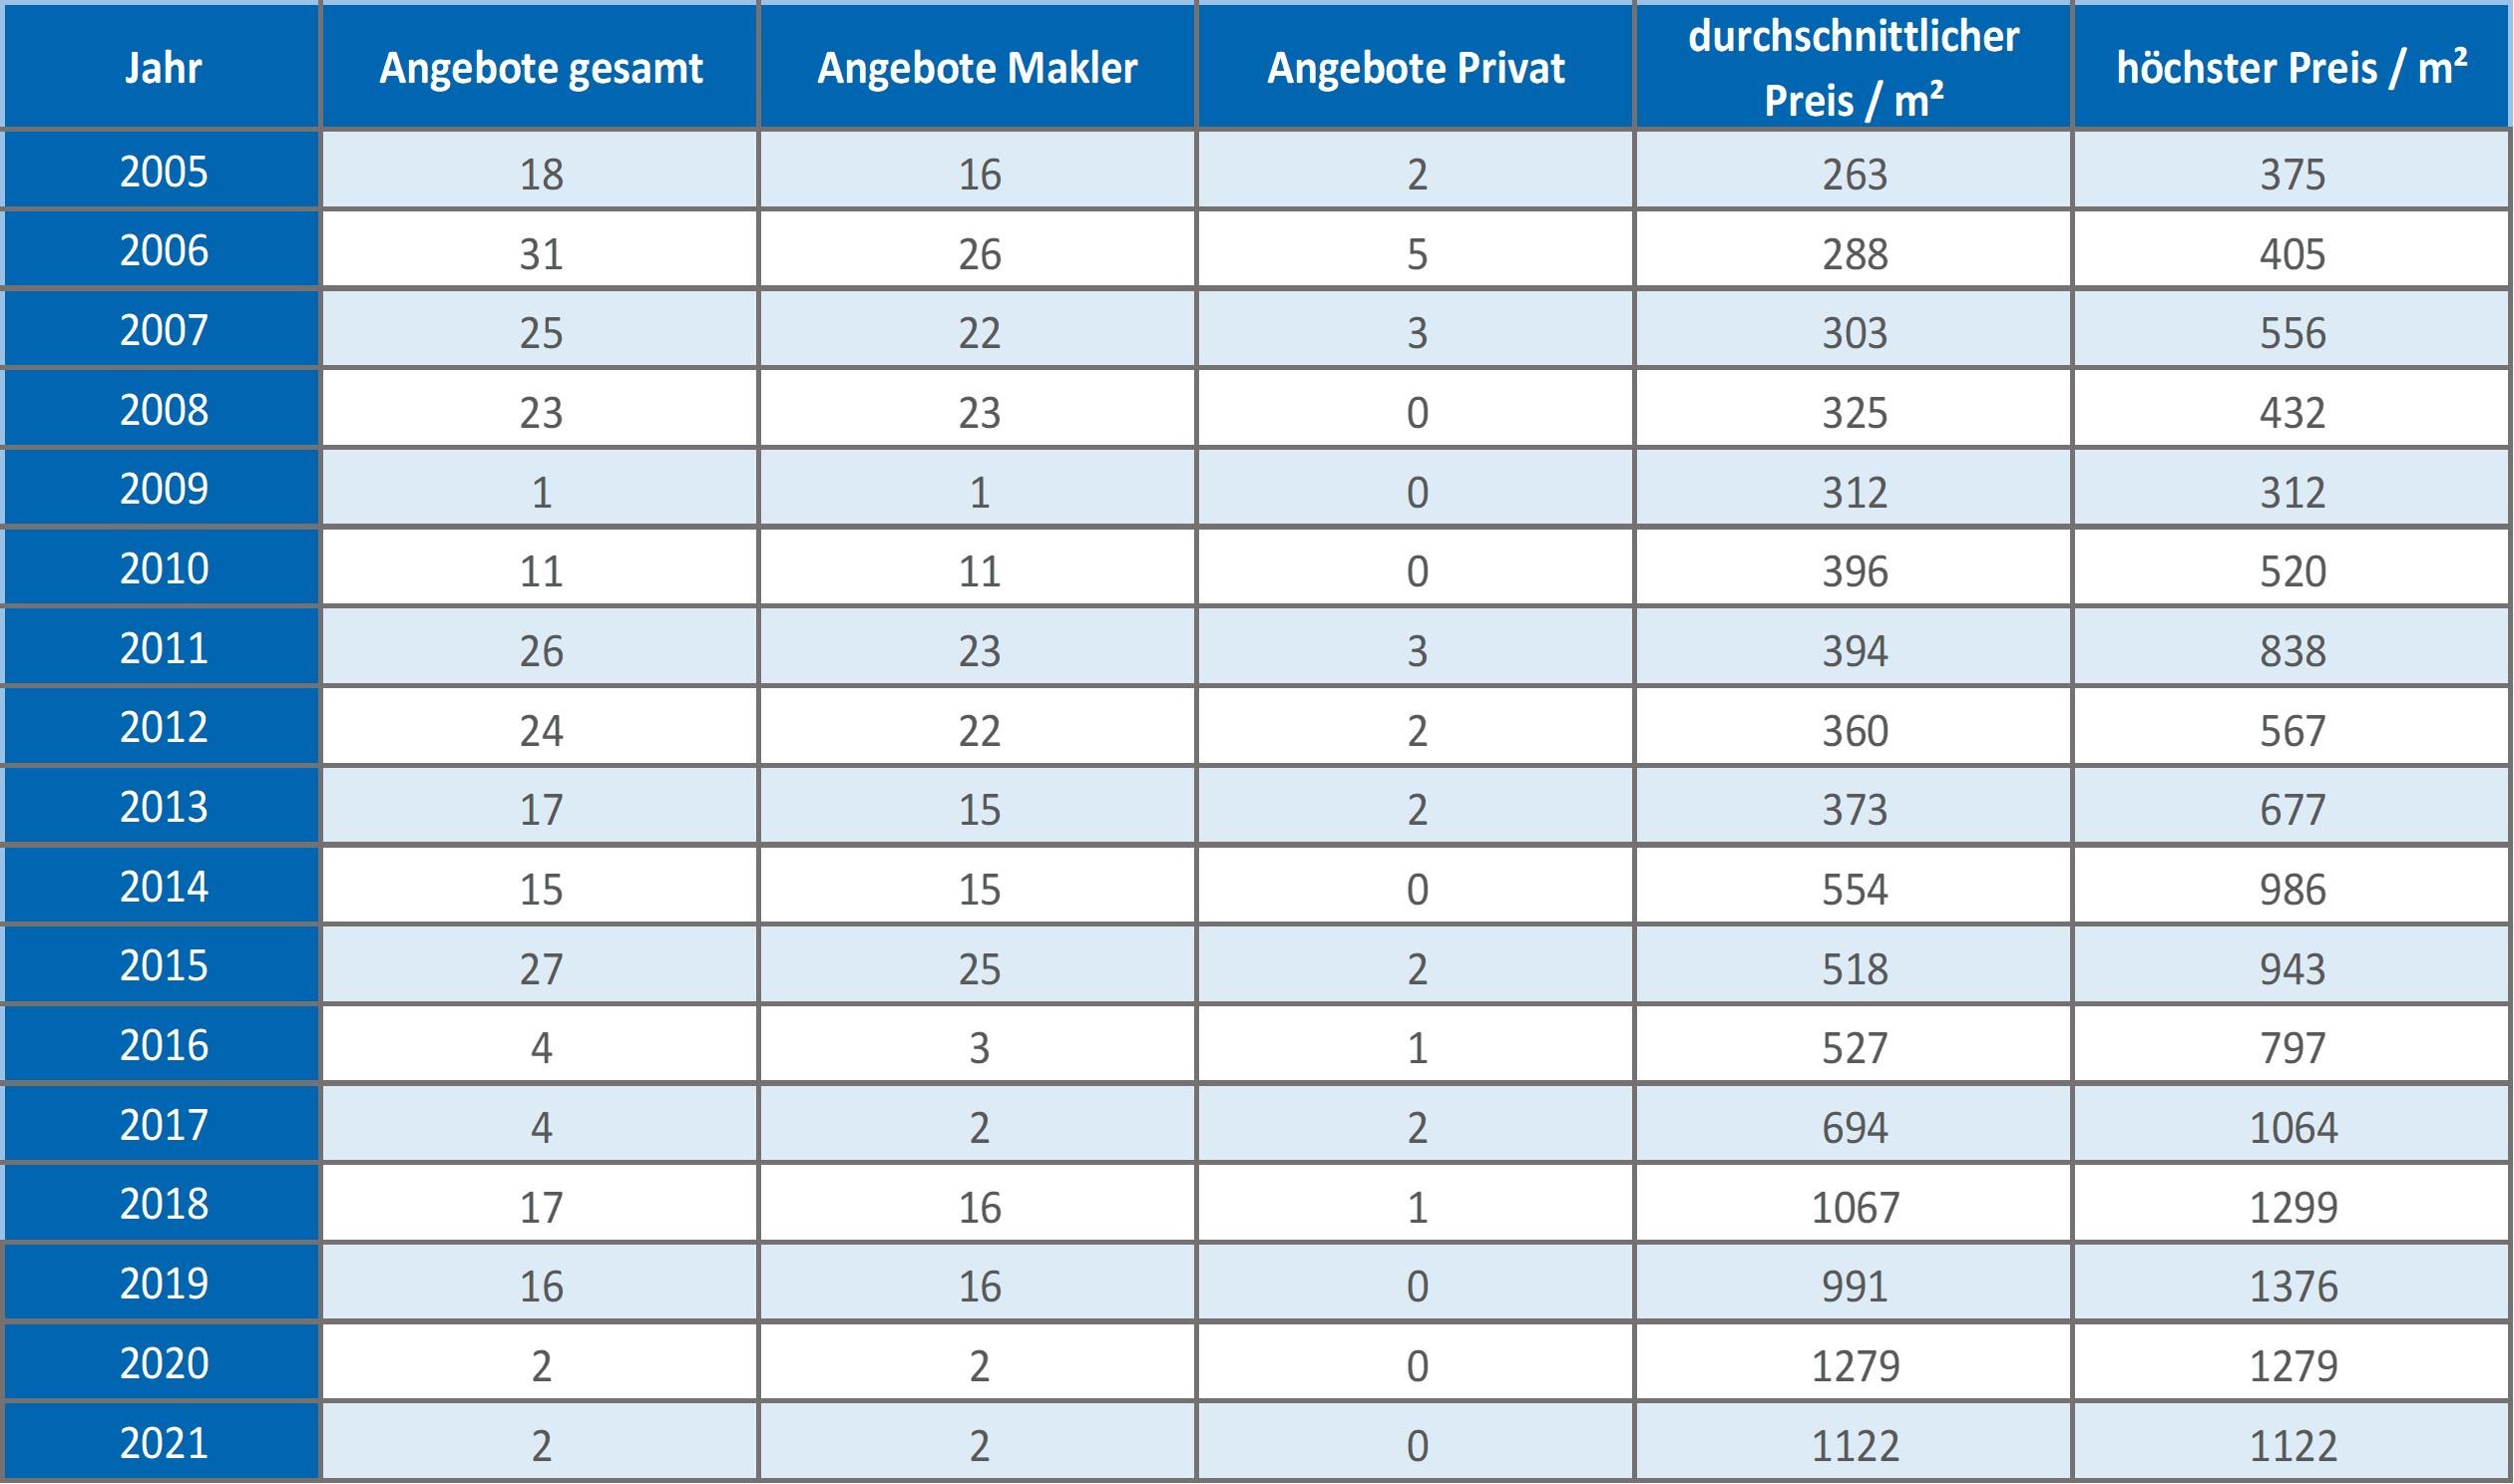 Geretsried Grundstück Makler kaufen verkaufen qm Preis Baurecht 2019 2020 2021